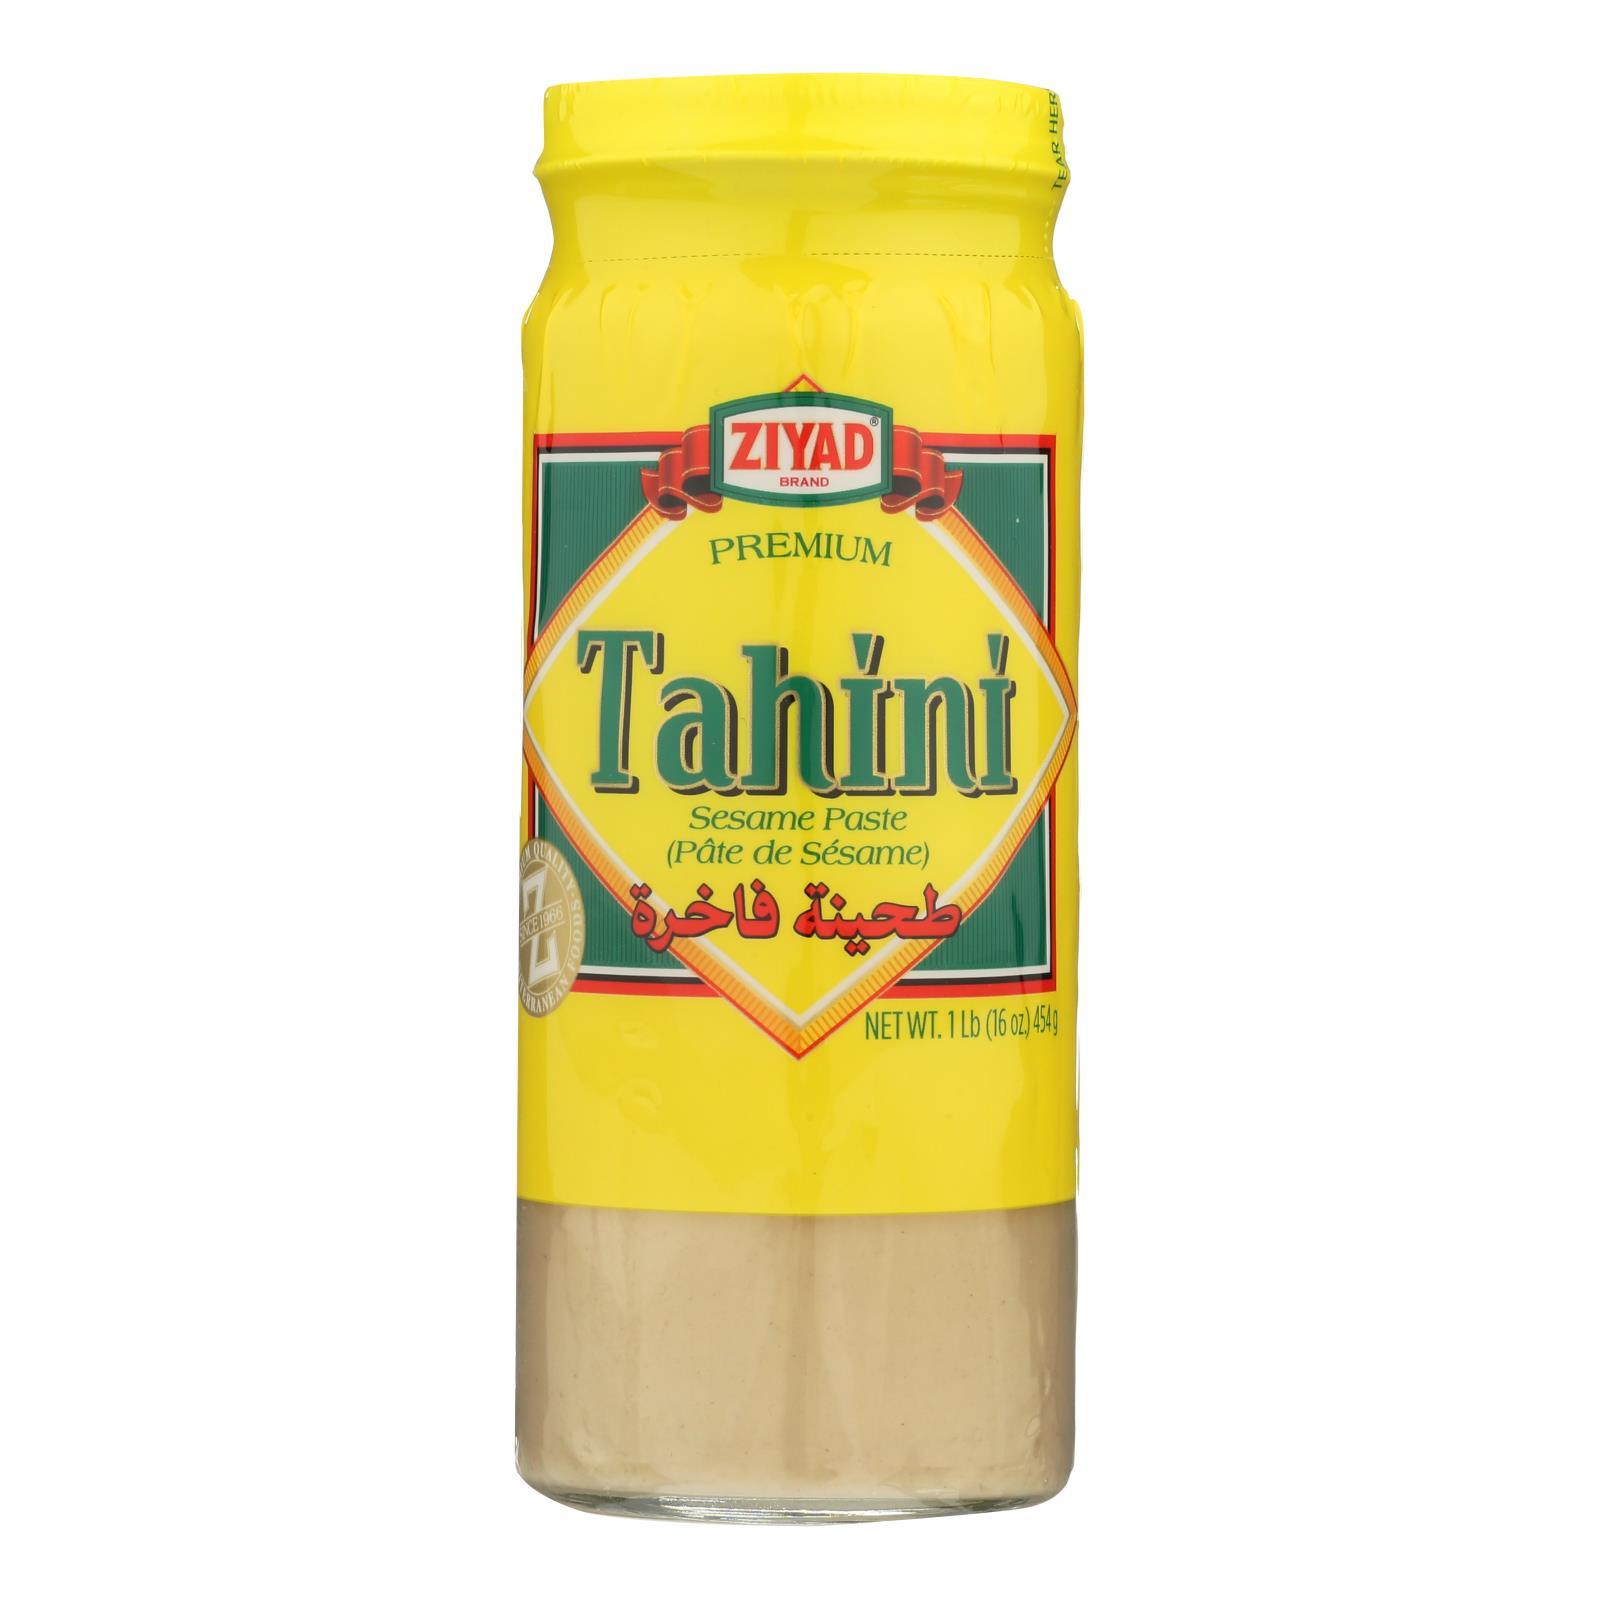 Ziyad Brand Tahini - Sesame Paste - Case of 6 - 16 oz.